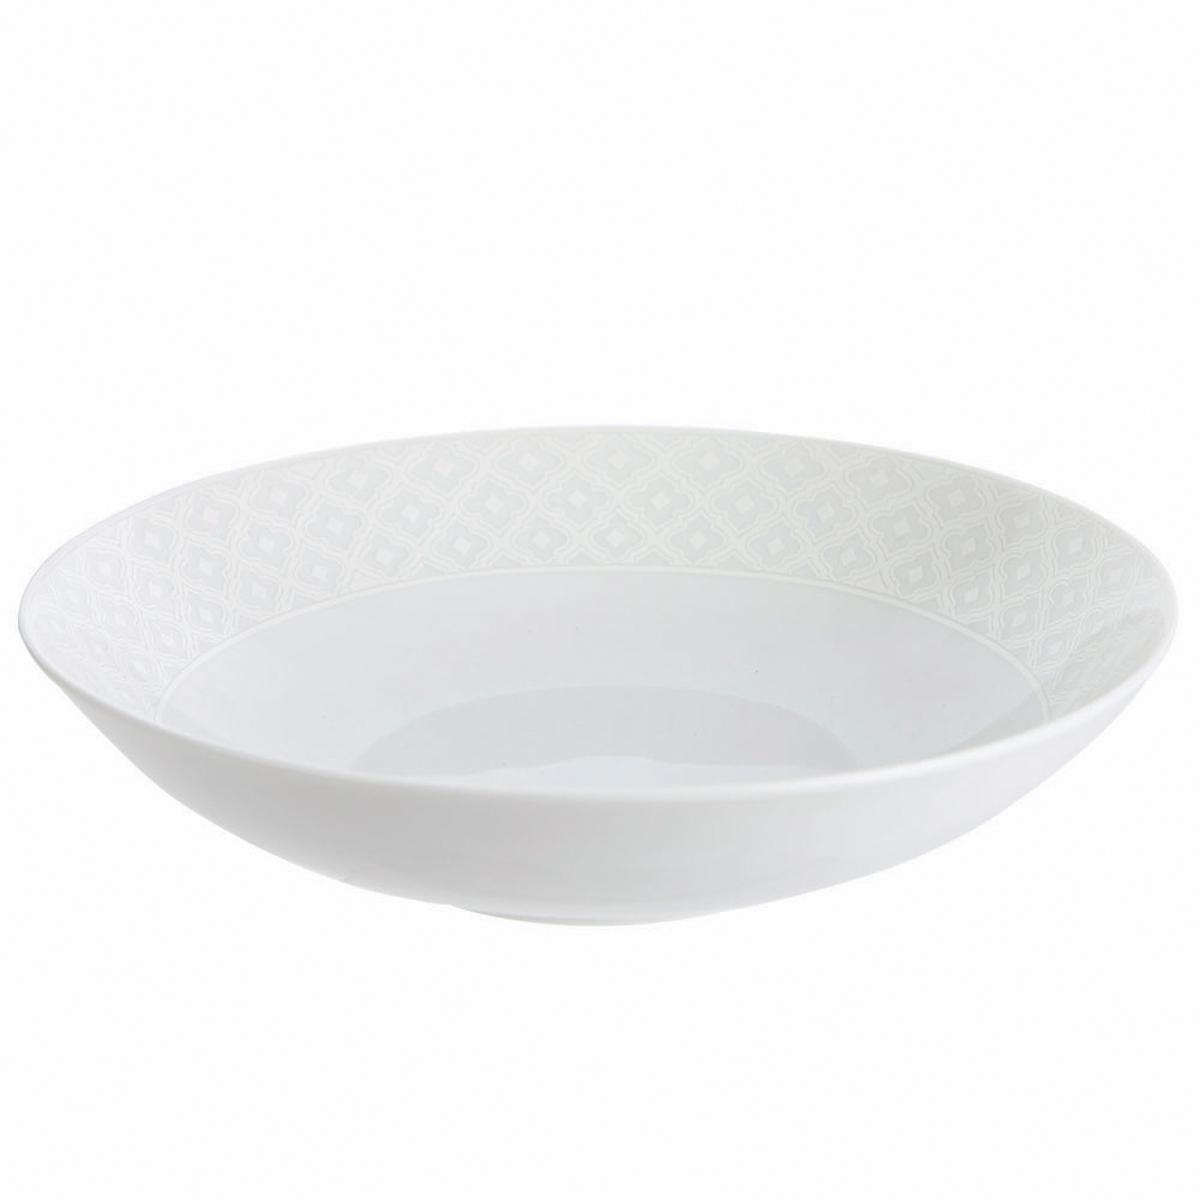 Тарелка суповая Churchill, диаметр 22 см